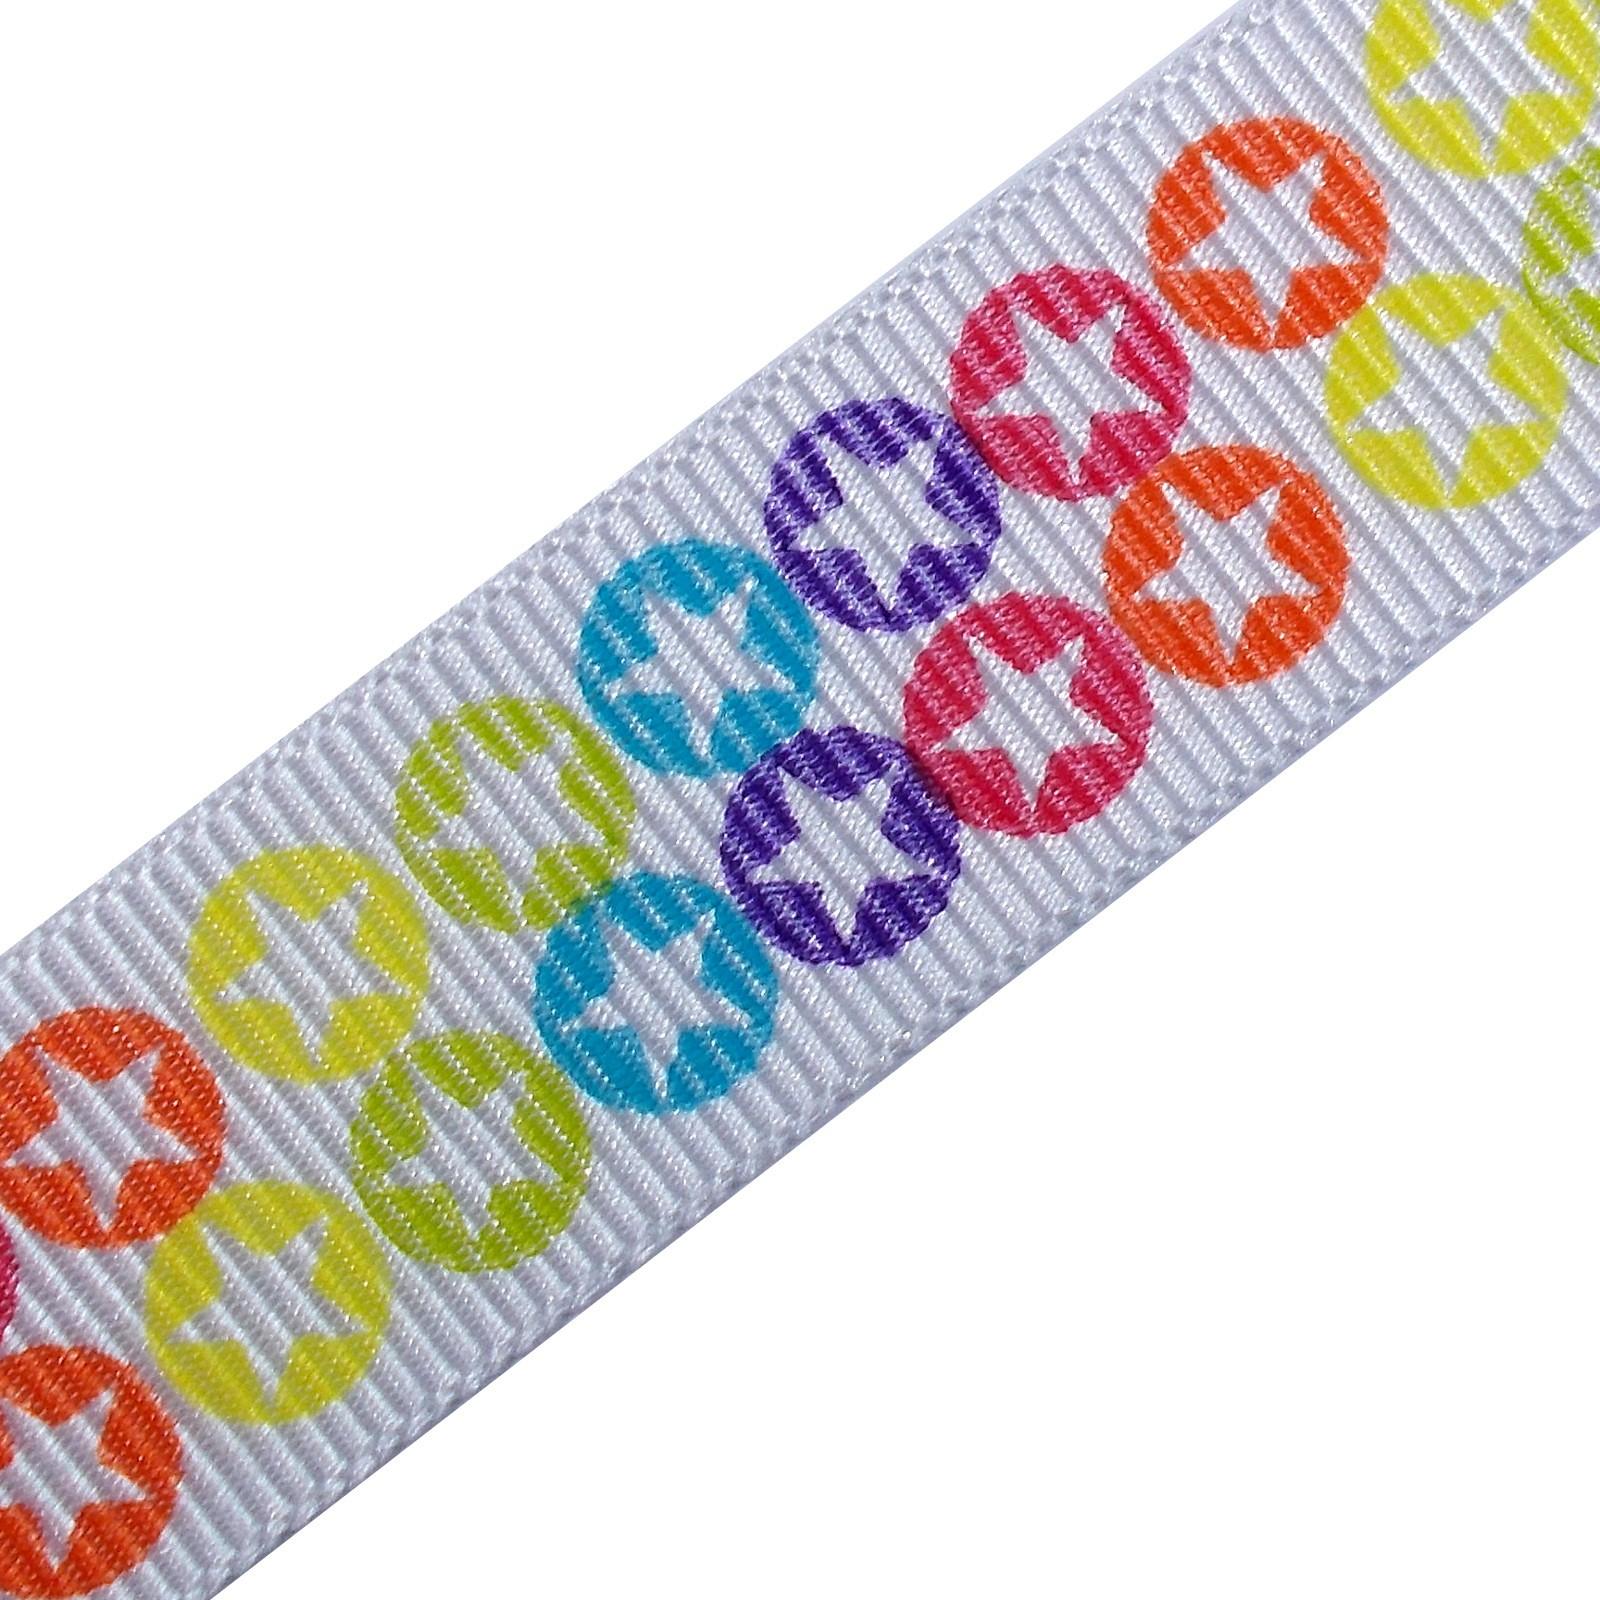 Berisfords Bright Rainbow Grosgrain Ribbon 16mm wide Stars 3 metre length